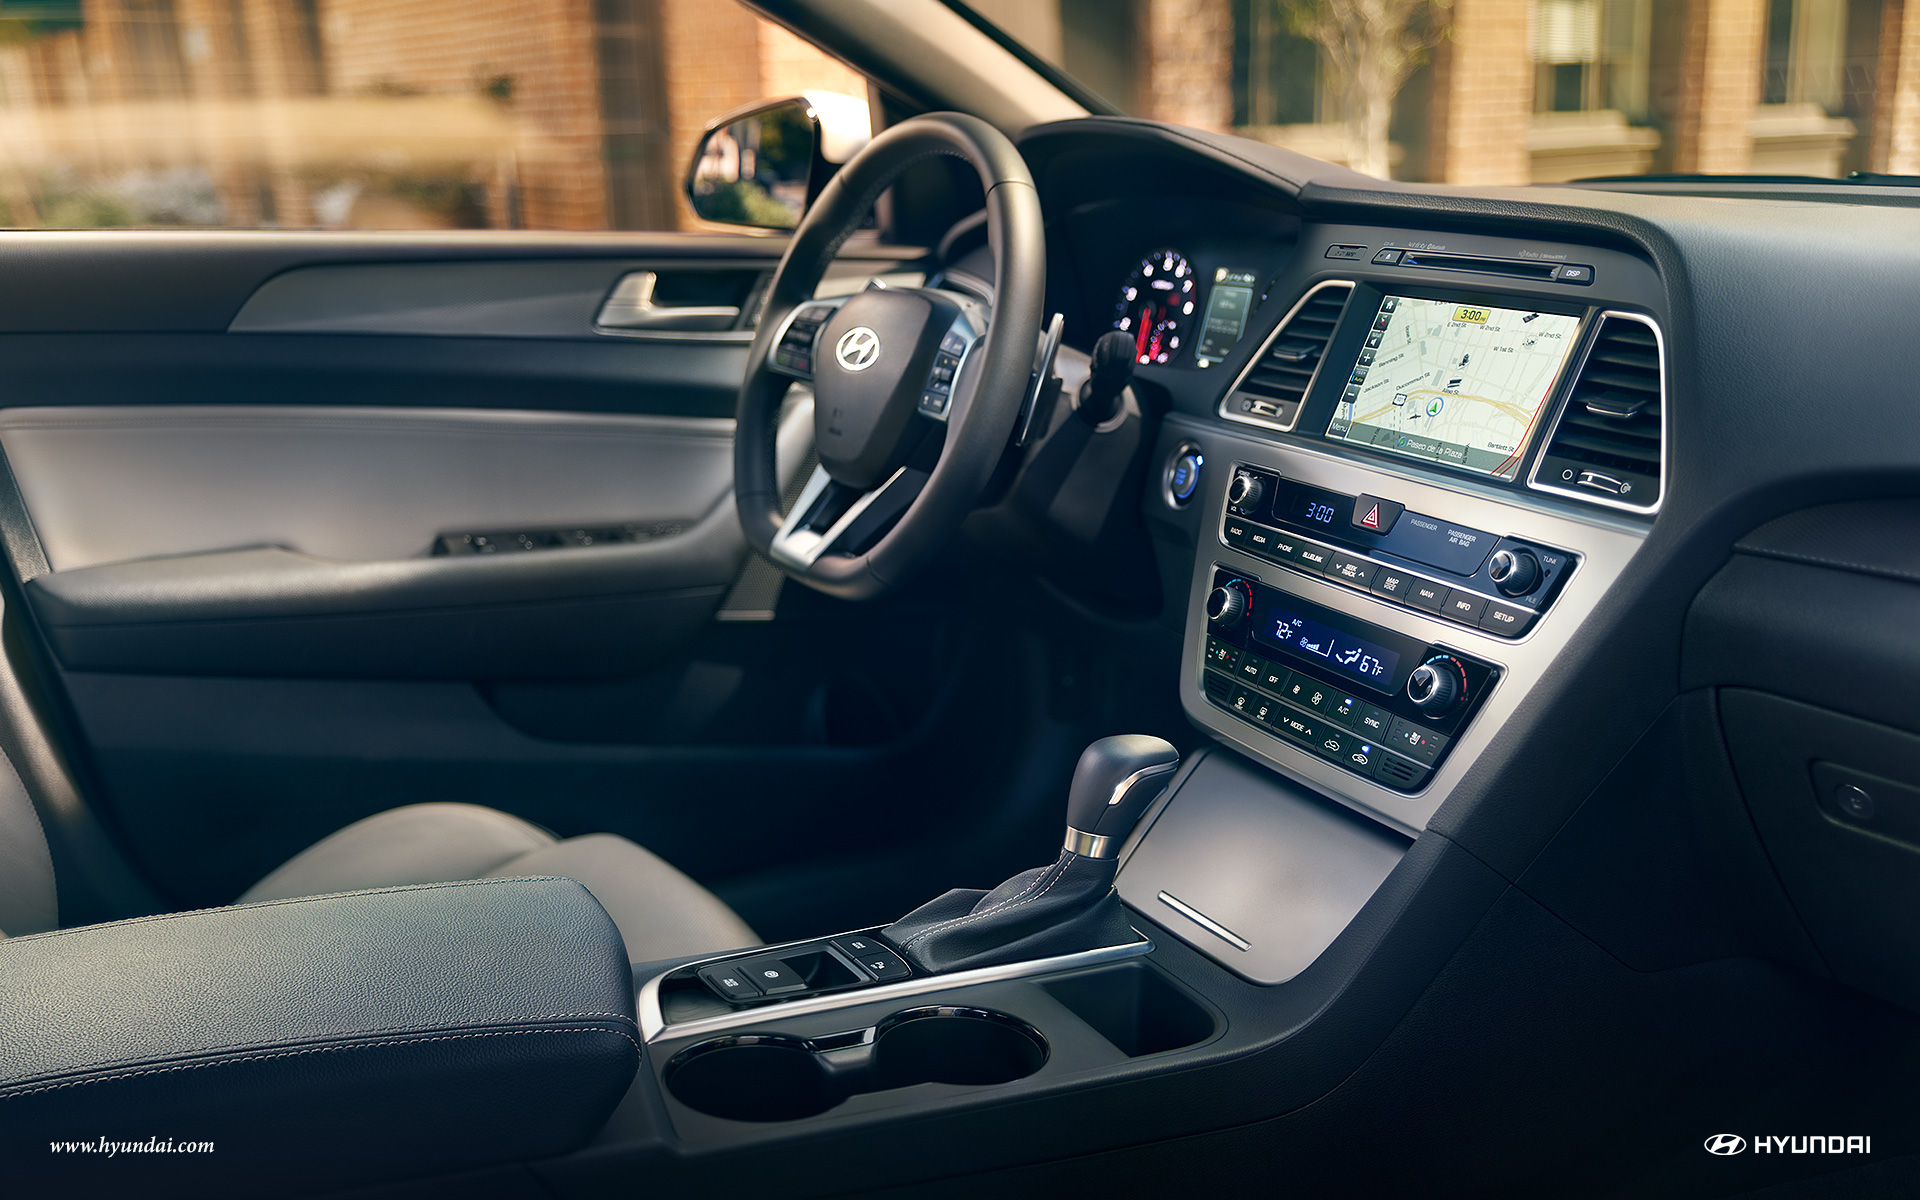 2017 Hyundai Sonata Interior 4